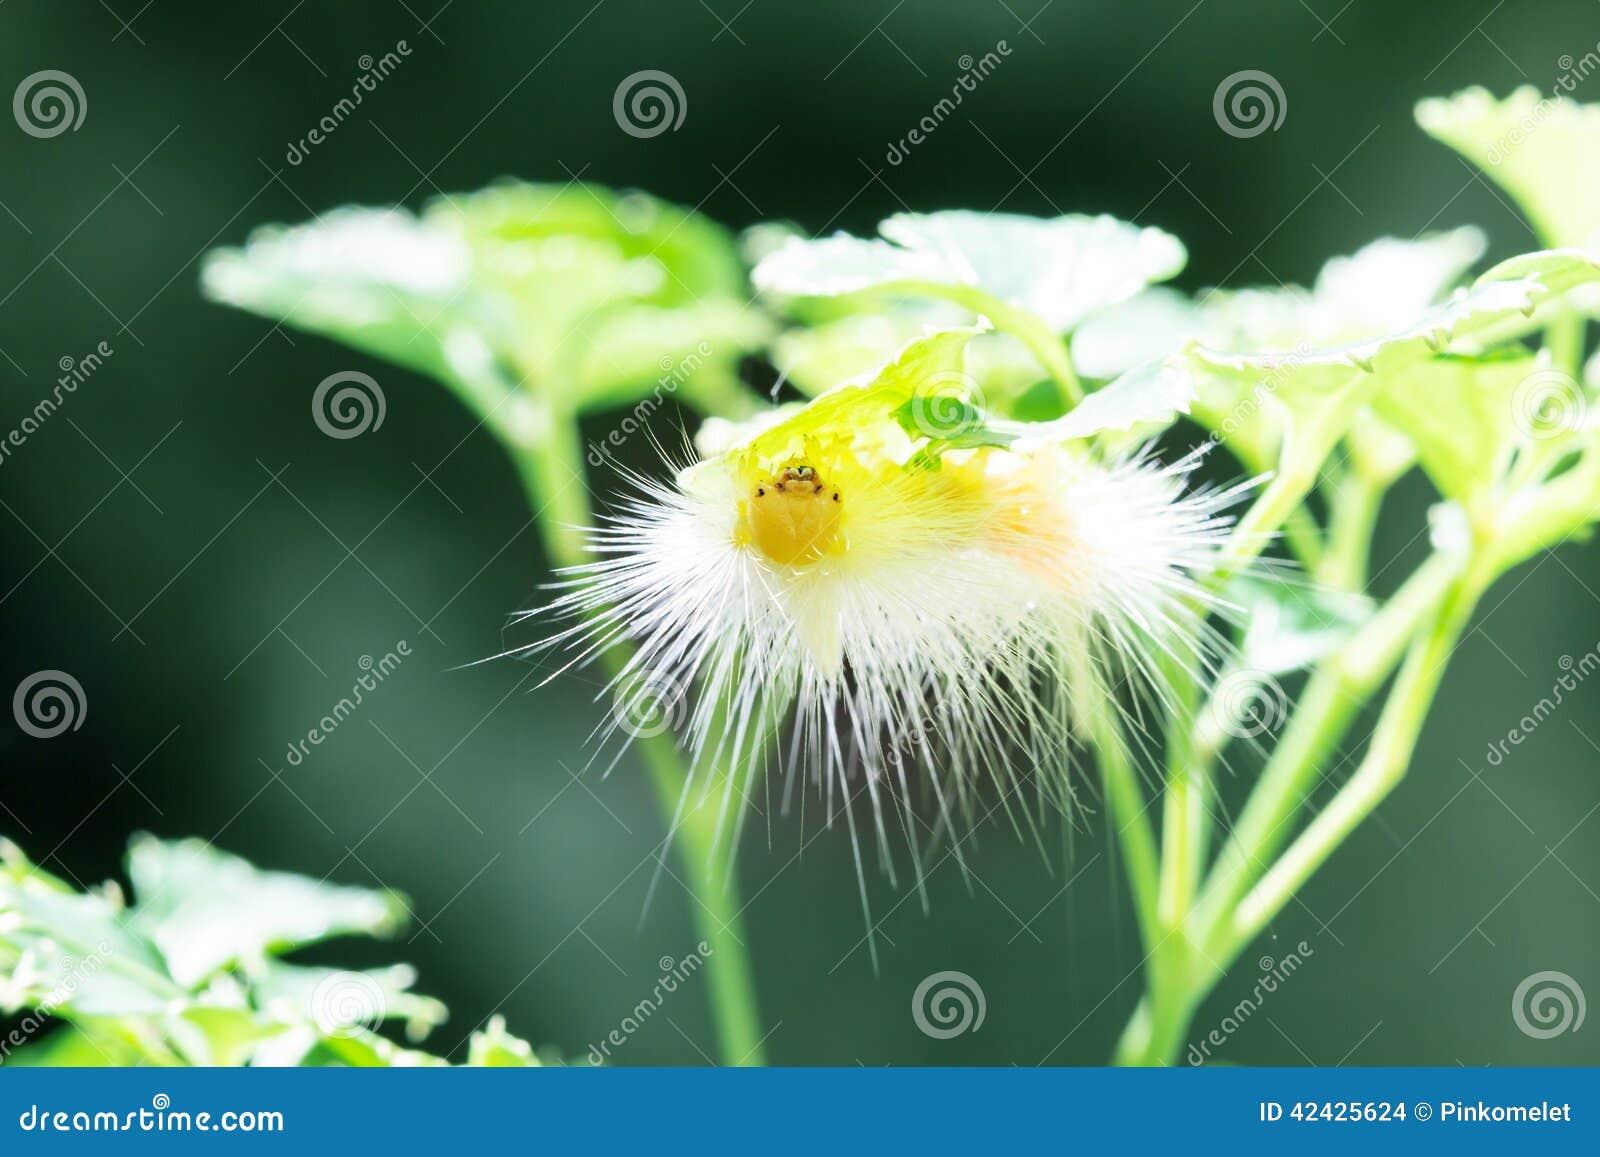 Gusano amarillo de la mariposa